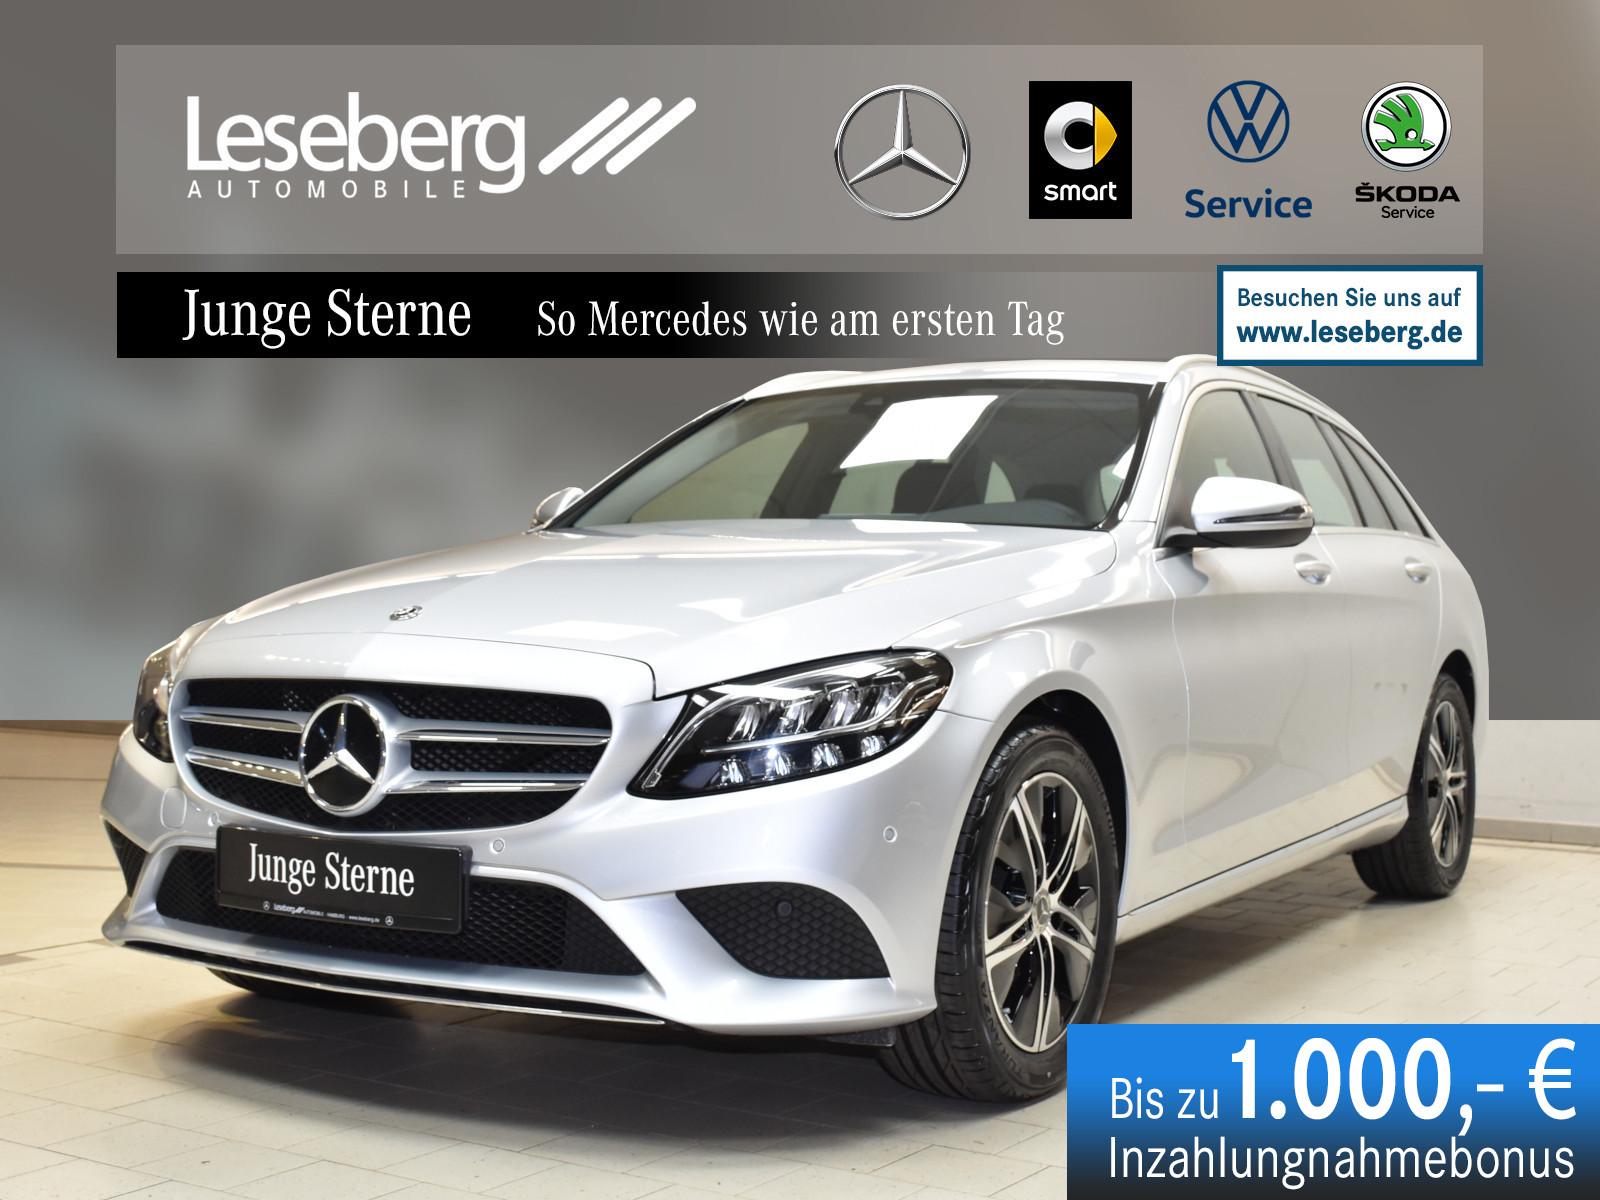 Mercedes-Benz C 200 d T Avantgarde/AHK/LED/Kamera/9G/Navi/Spur, Jahr 2020, Diesel